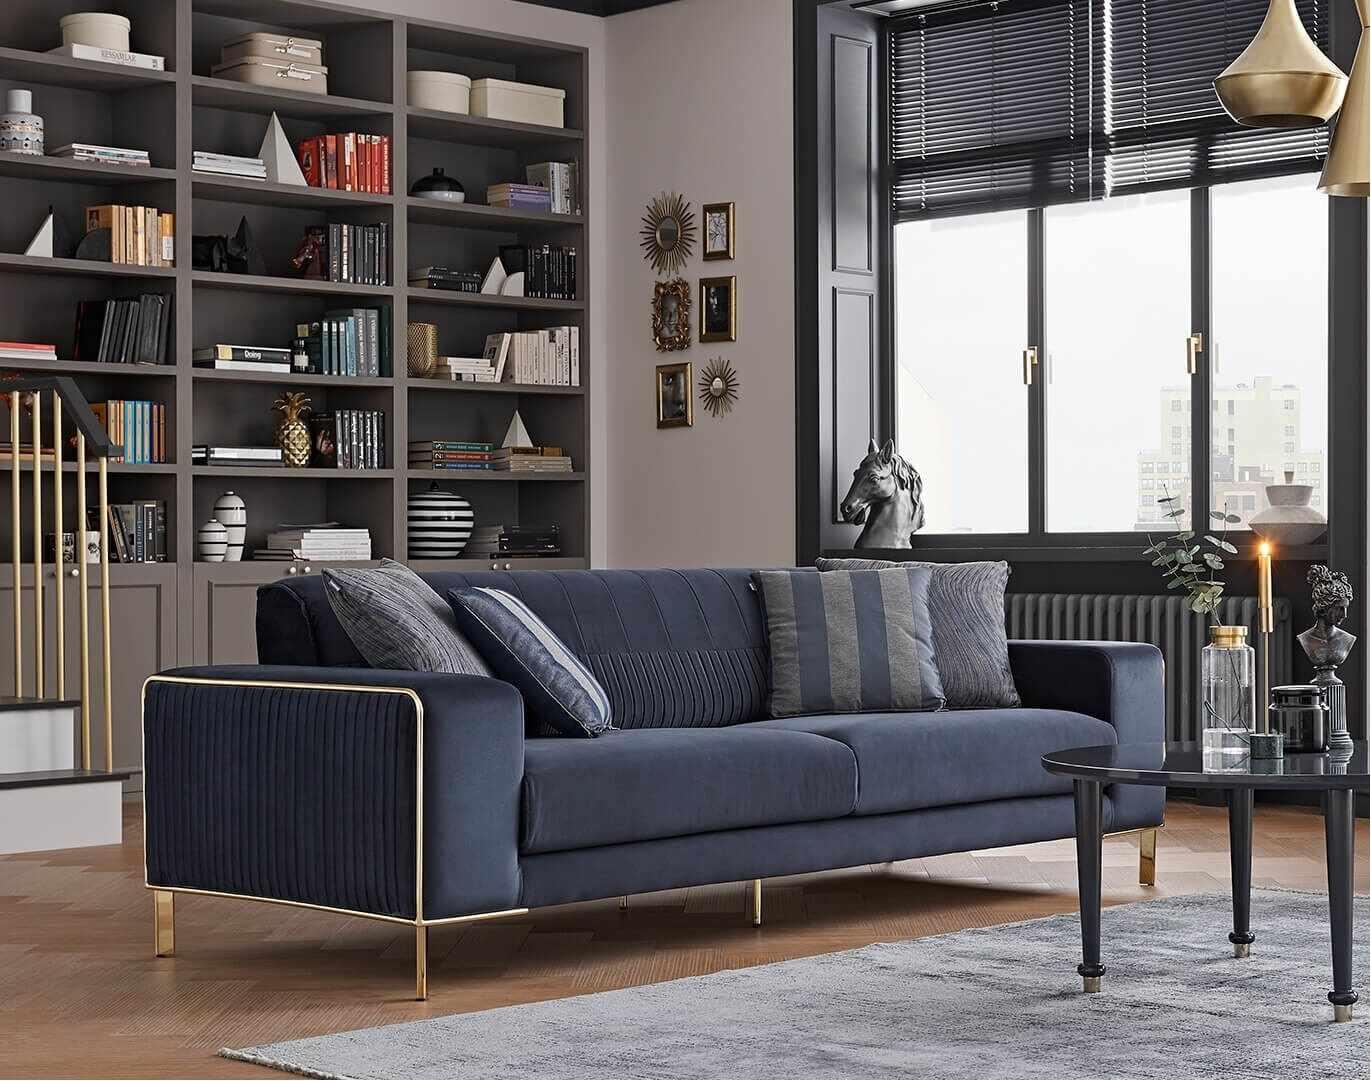 Canapea tapitata cu stofa, 3 locuri, cu functie sleep pentru 1 persoana Adel Bleumarin, l230xA97xH80 cm la pret 4951 lei